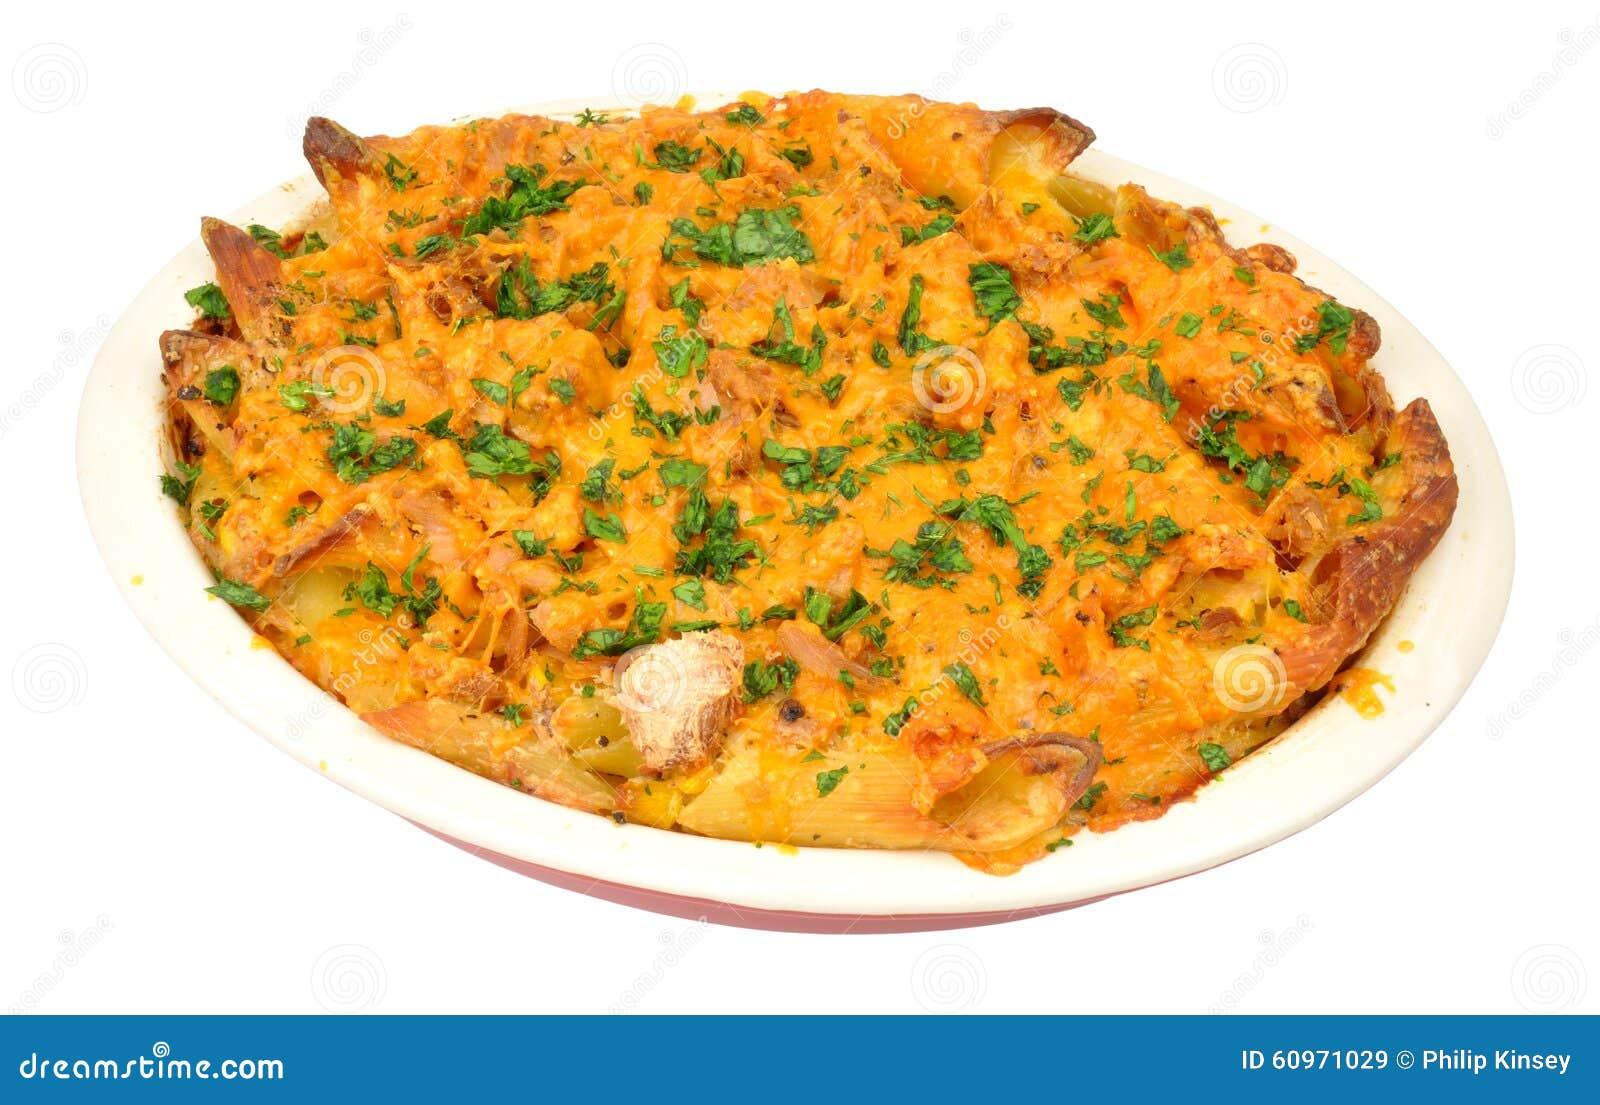 Tuna And Cheese Pasta Bake